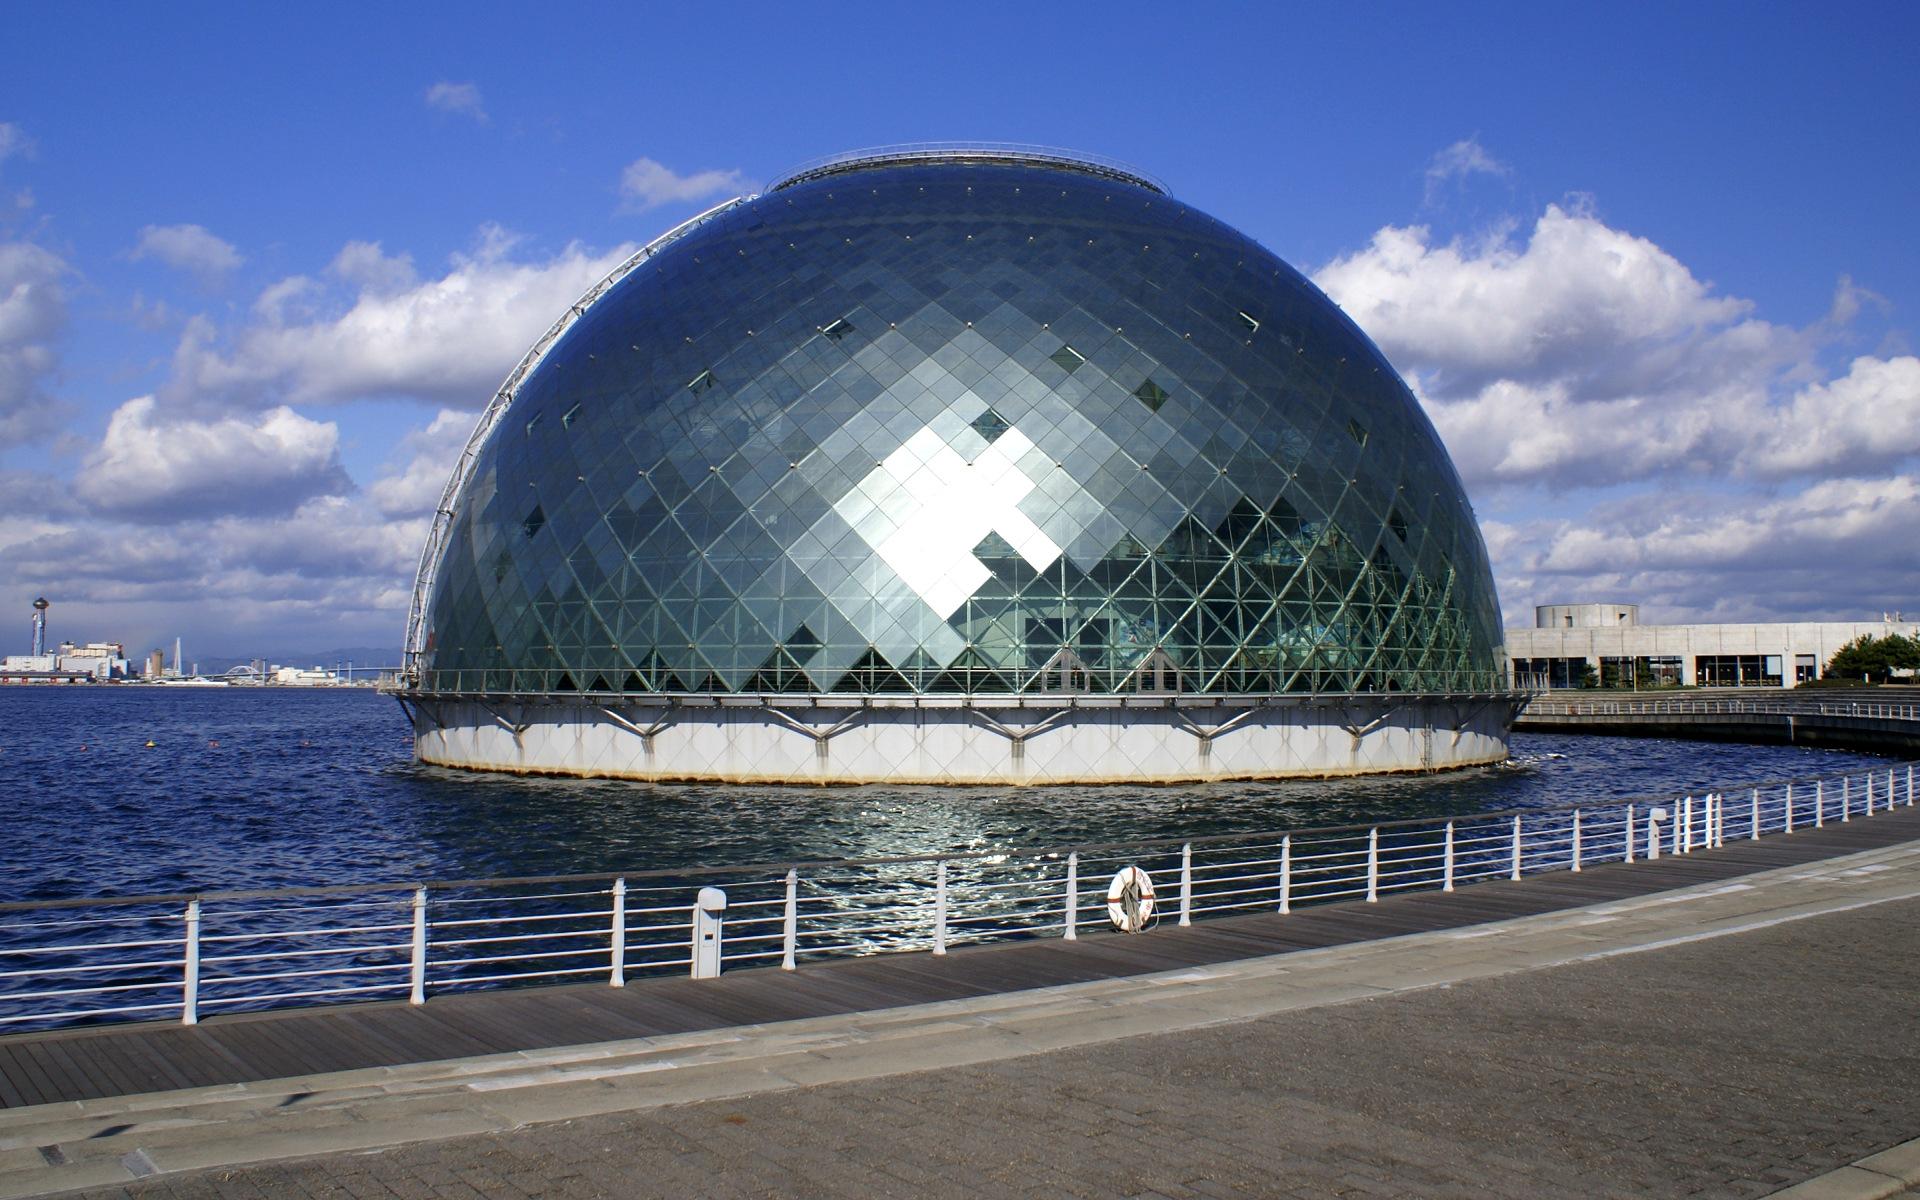 Картинка Морской музей, Осака, Япония ...: www.kartinki24.ru/kartinki/muzei/18562.html